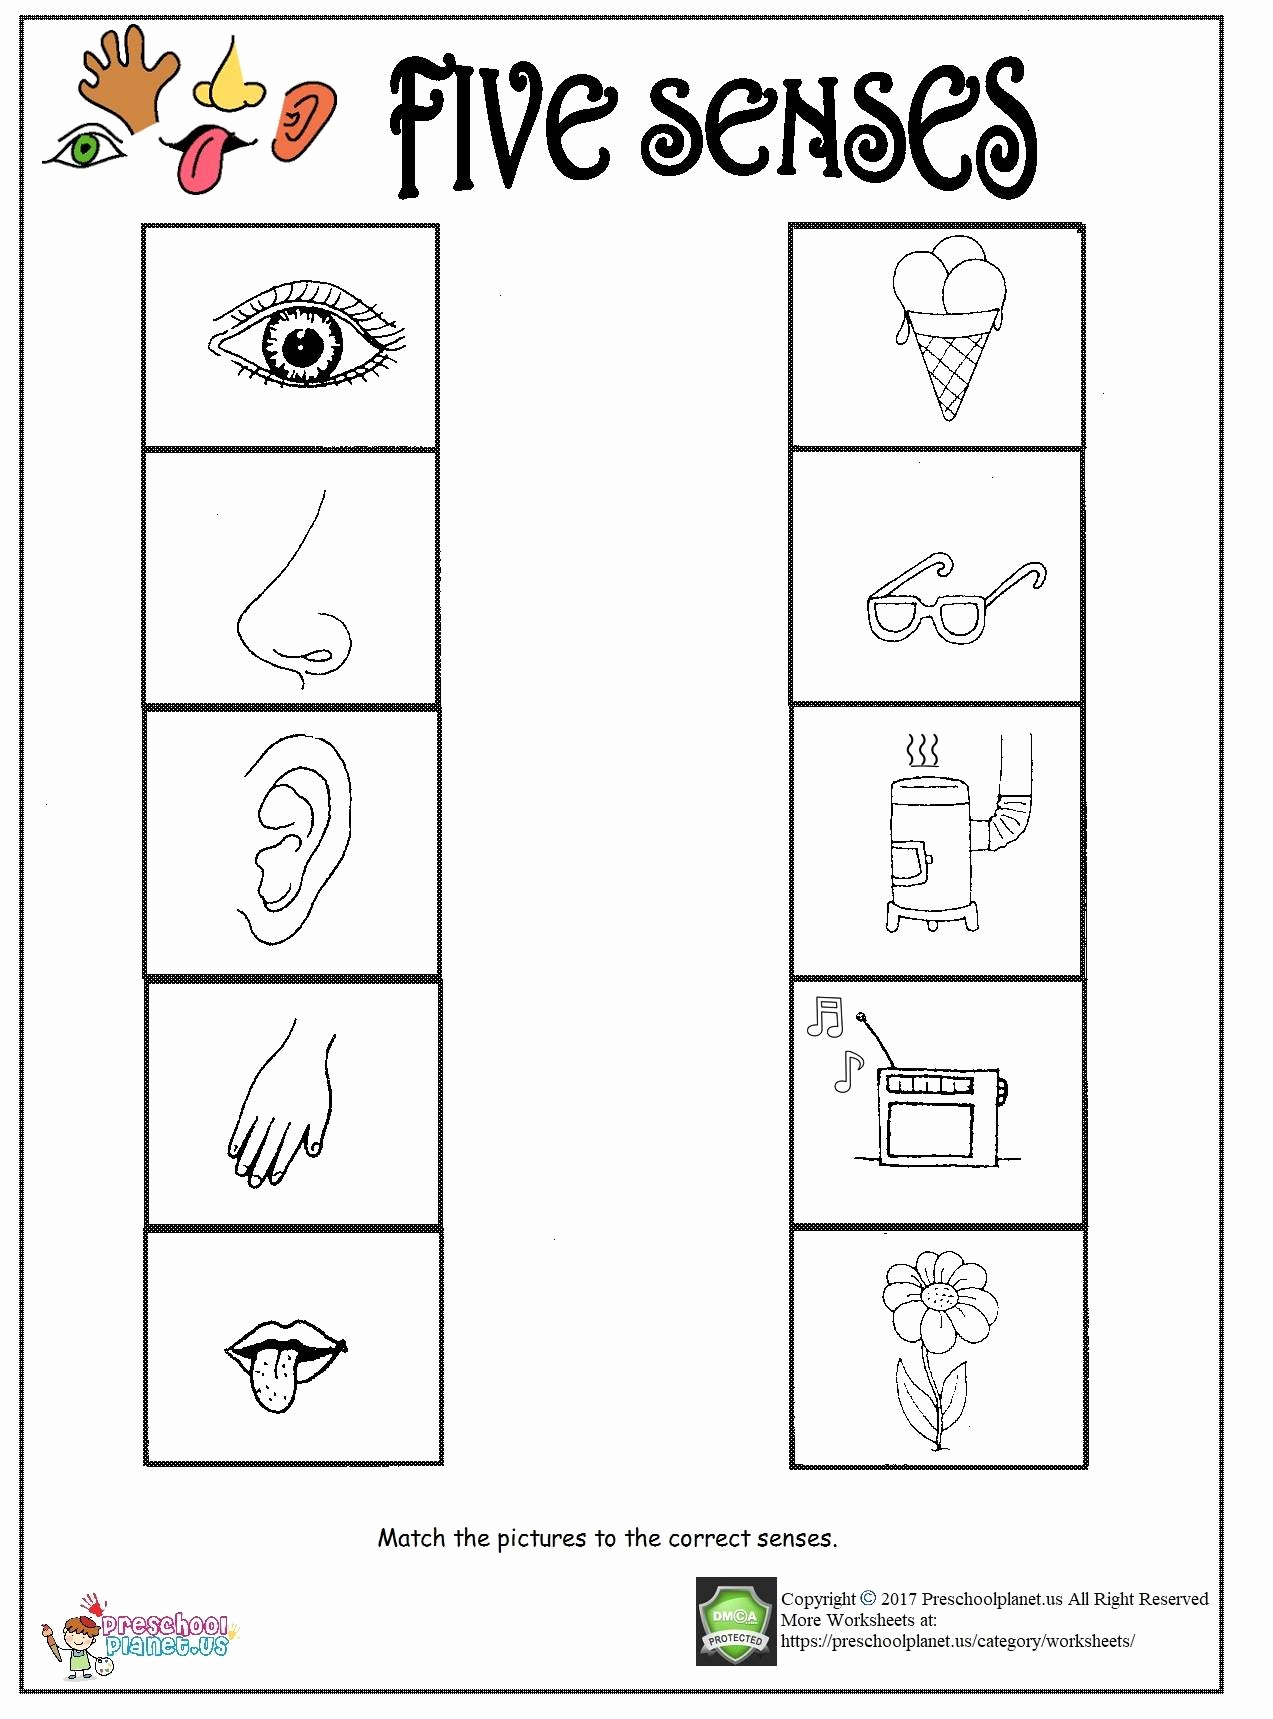 Five Senses Worksheets for Kindergarten Best Of Printable Five Senses Worksheet